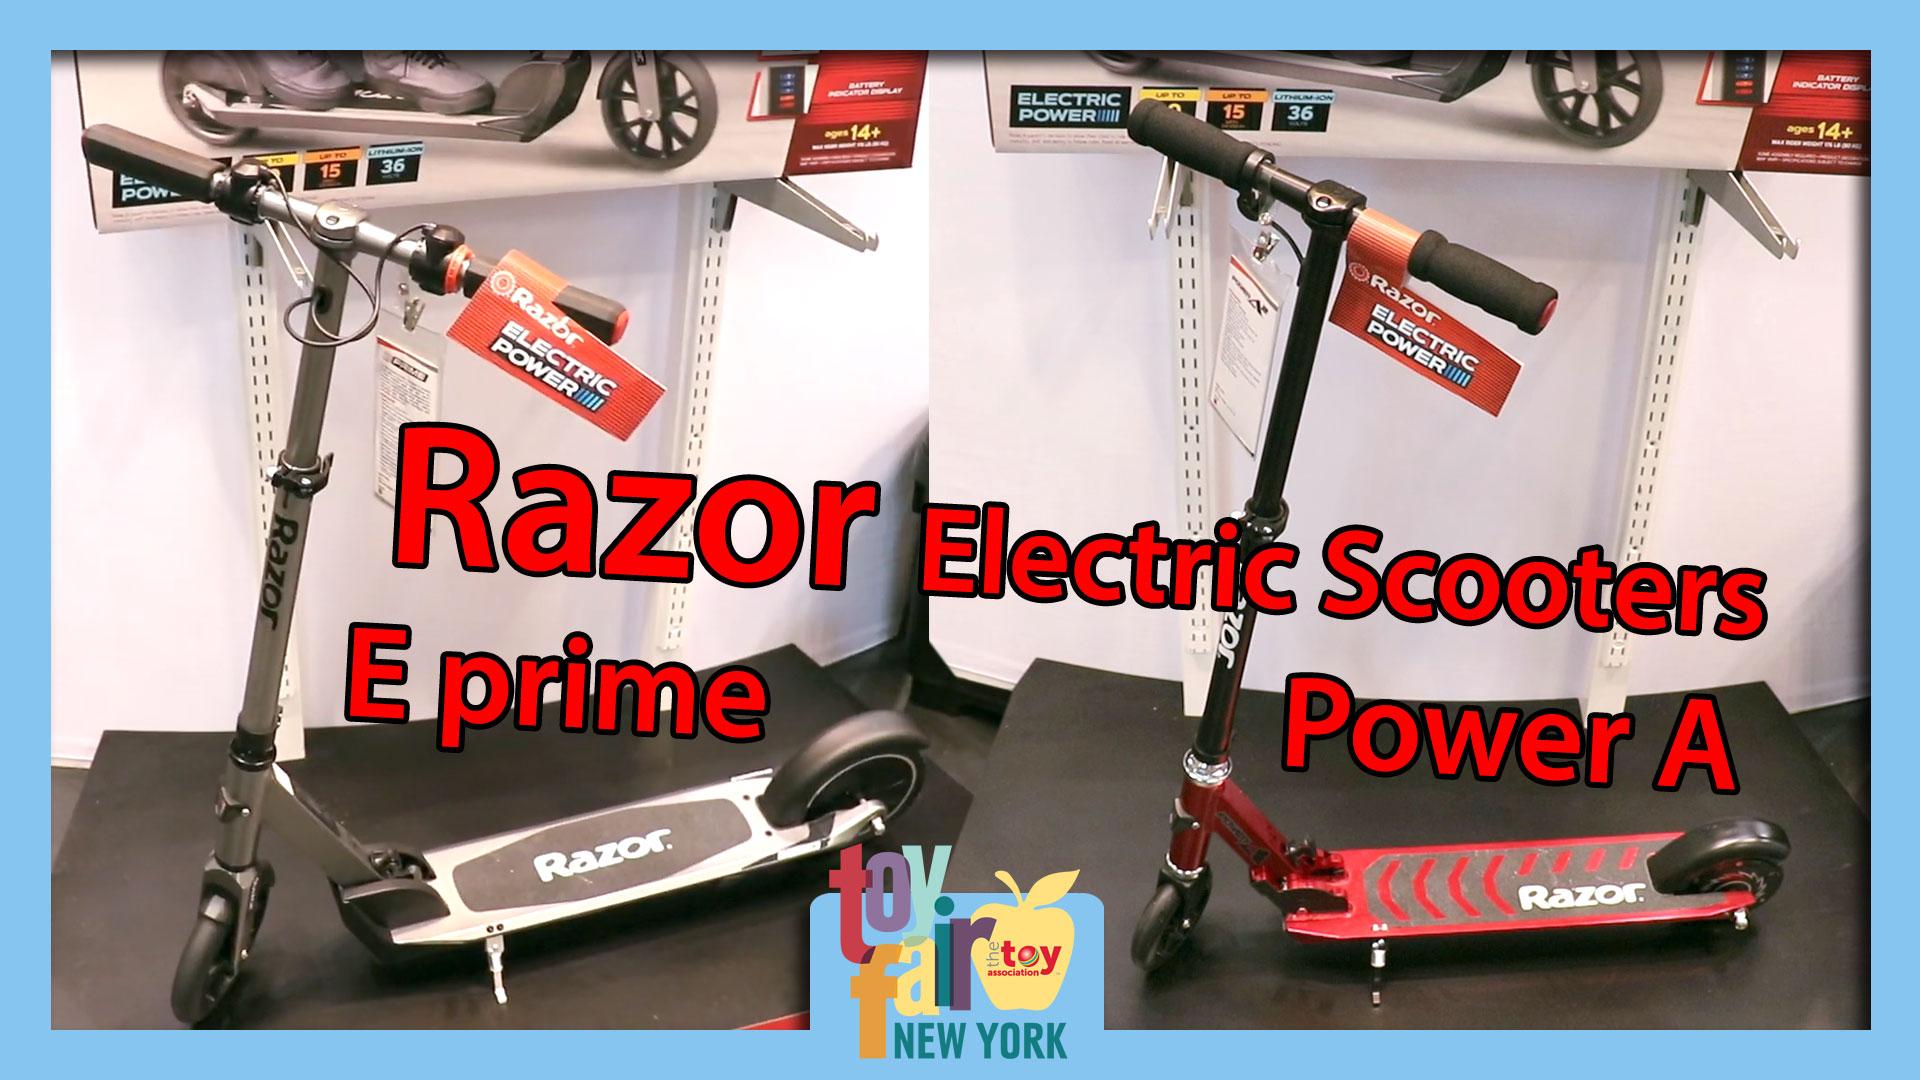 Razor Electric Scooters